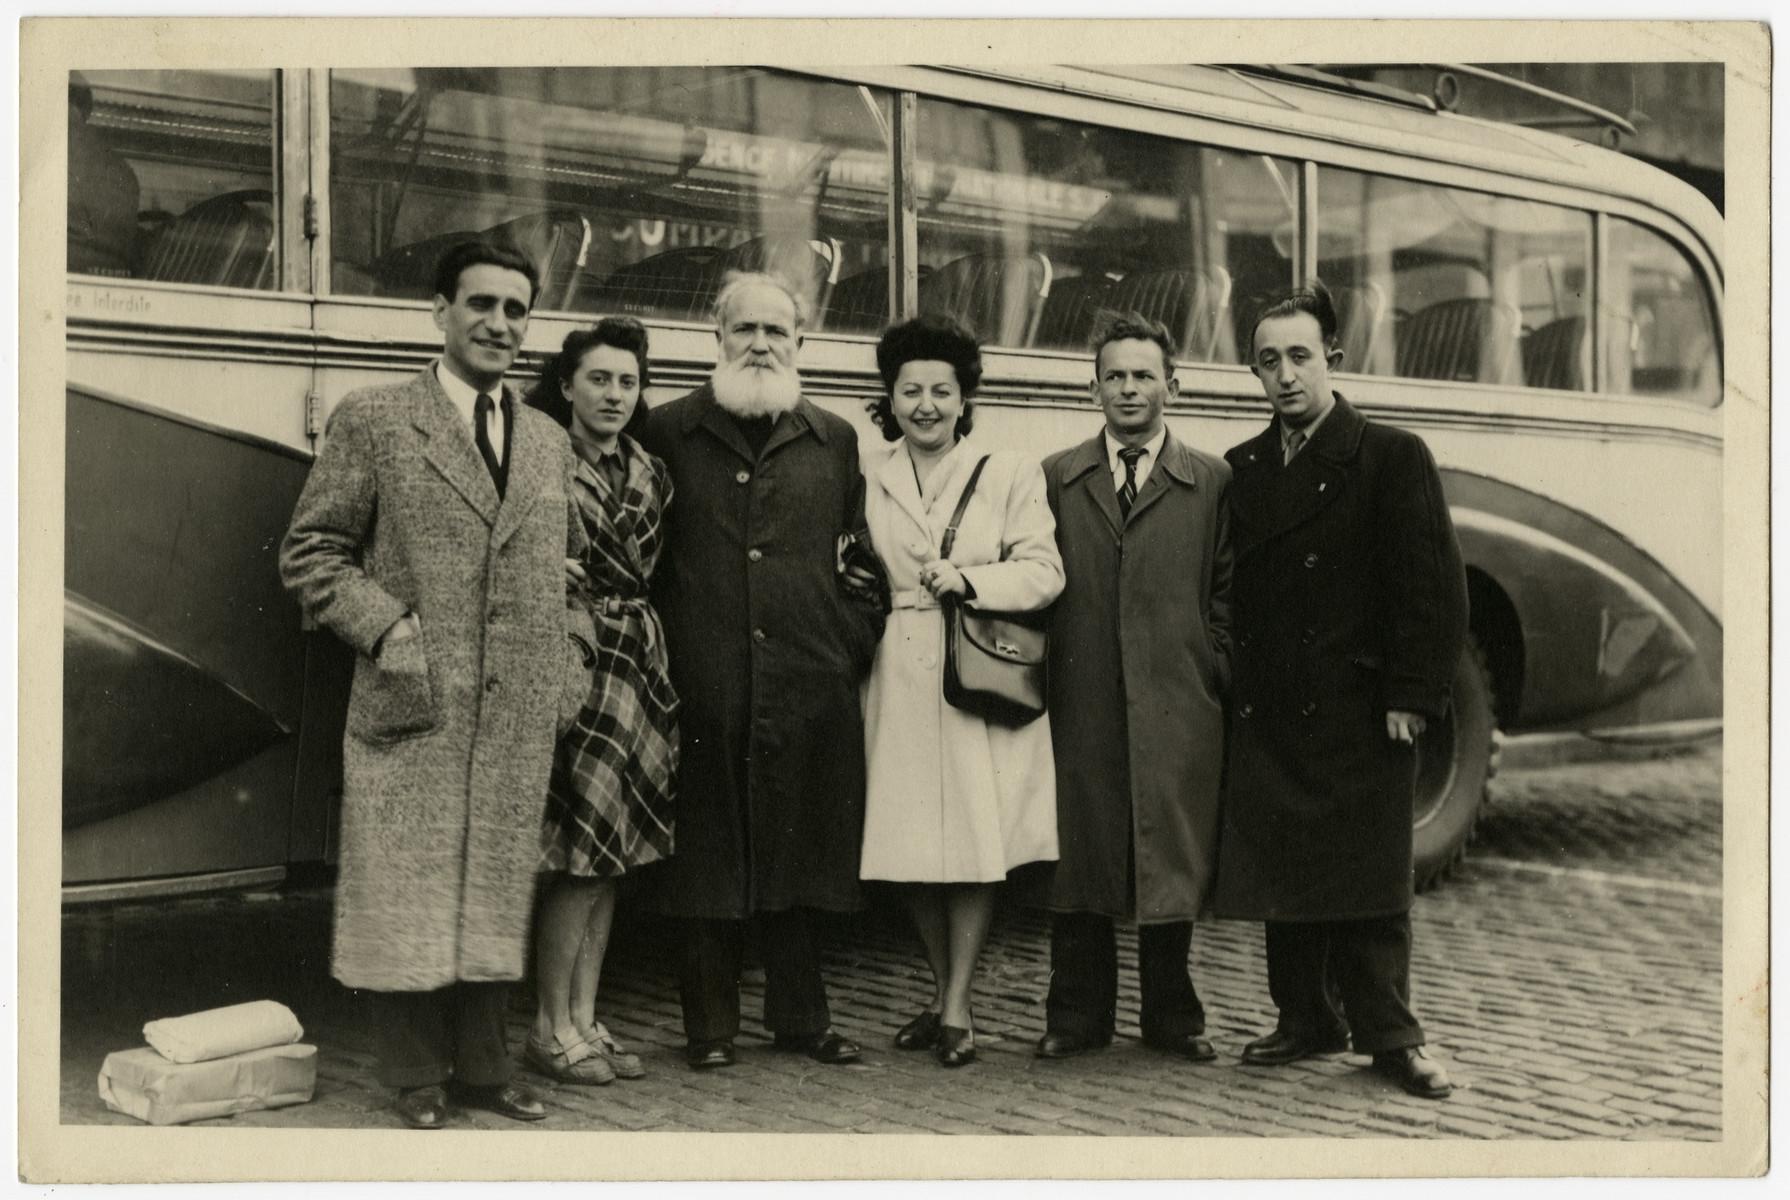 Group portrait of leaders of Left Poalei Zion in Belgium.  From left to right are Abush Werber, Zahava Bunim (head of the youth movement), Jacob Zerubavel, Fela Perelman, Avramel Lipskind and Zyskind Rabinowitz.